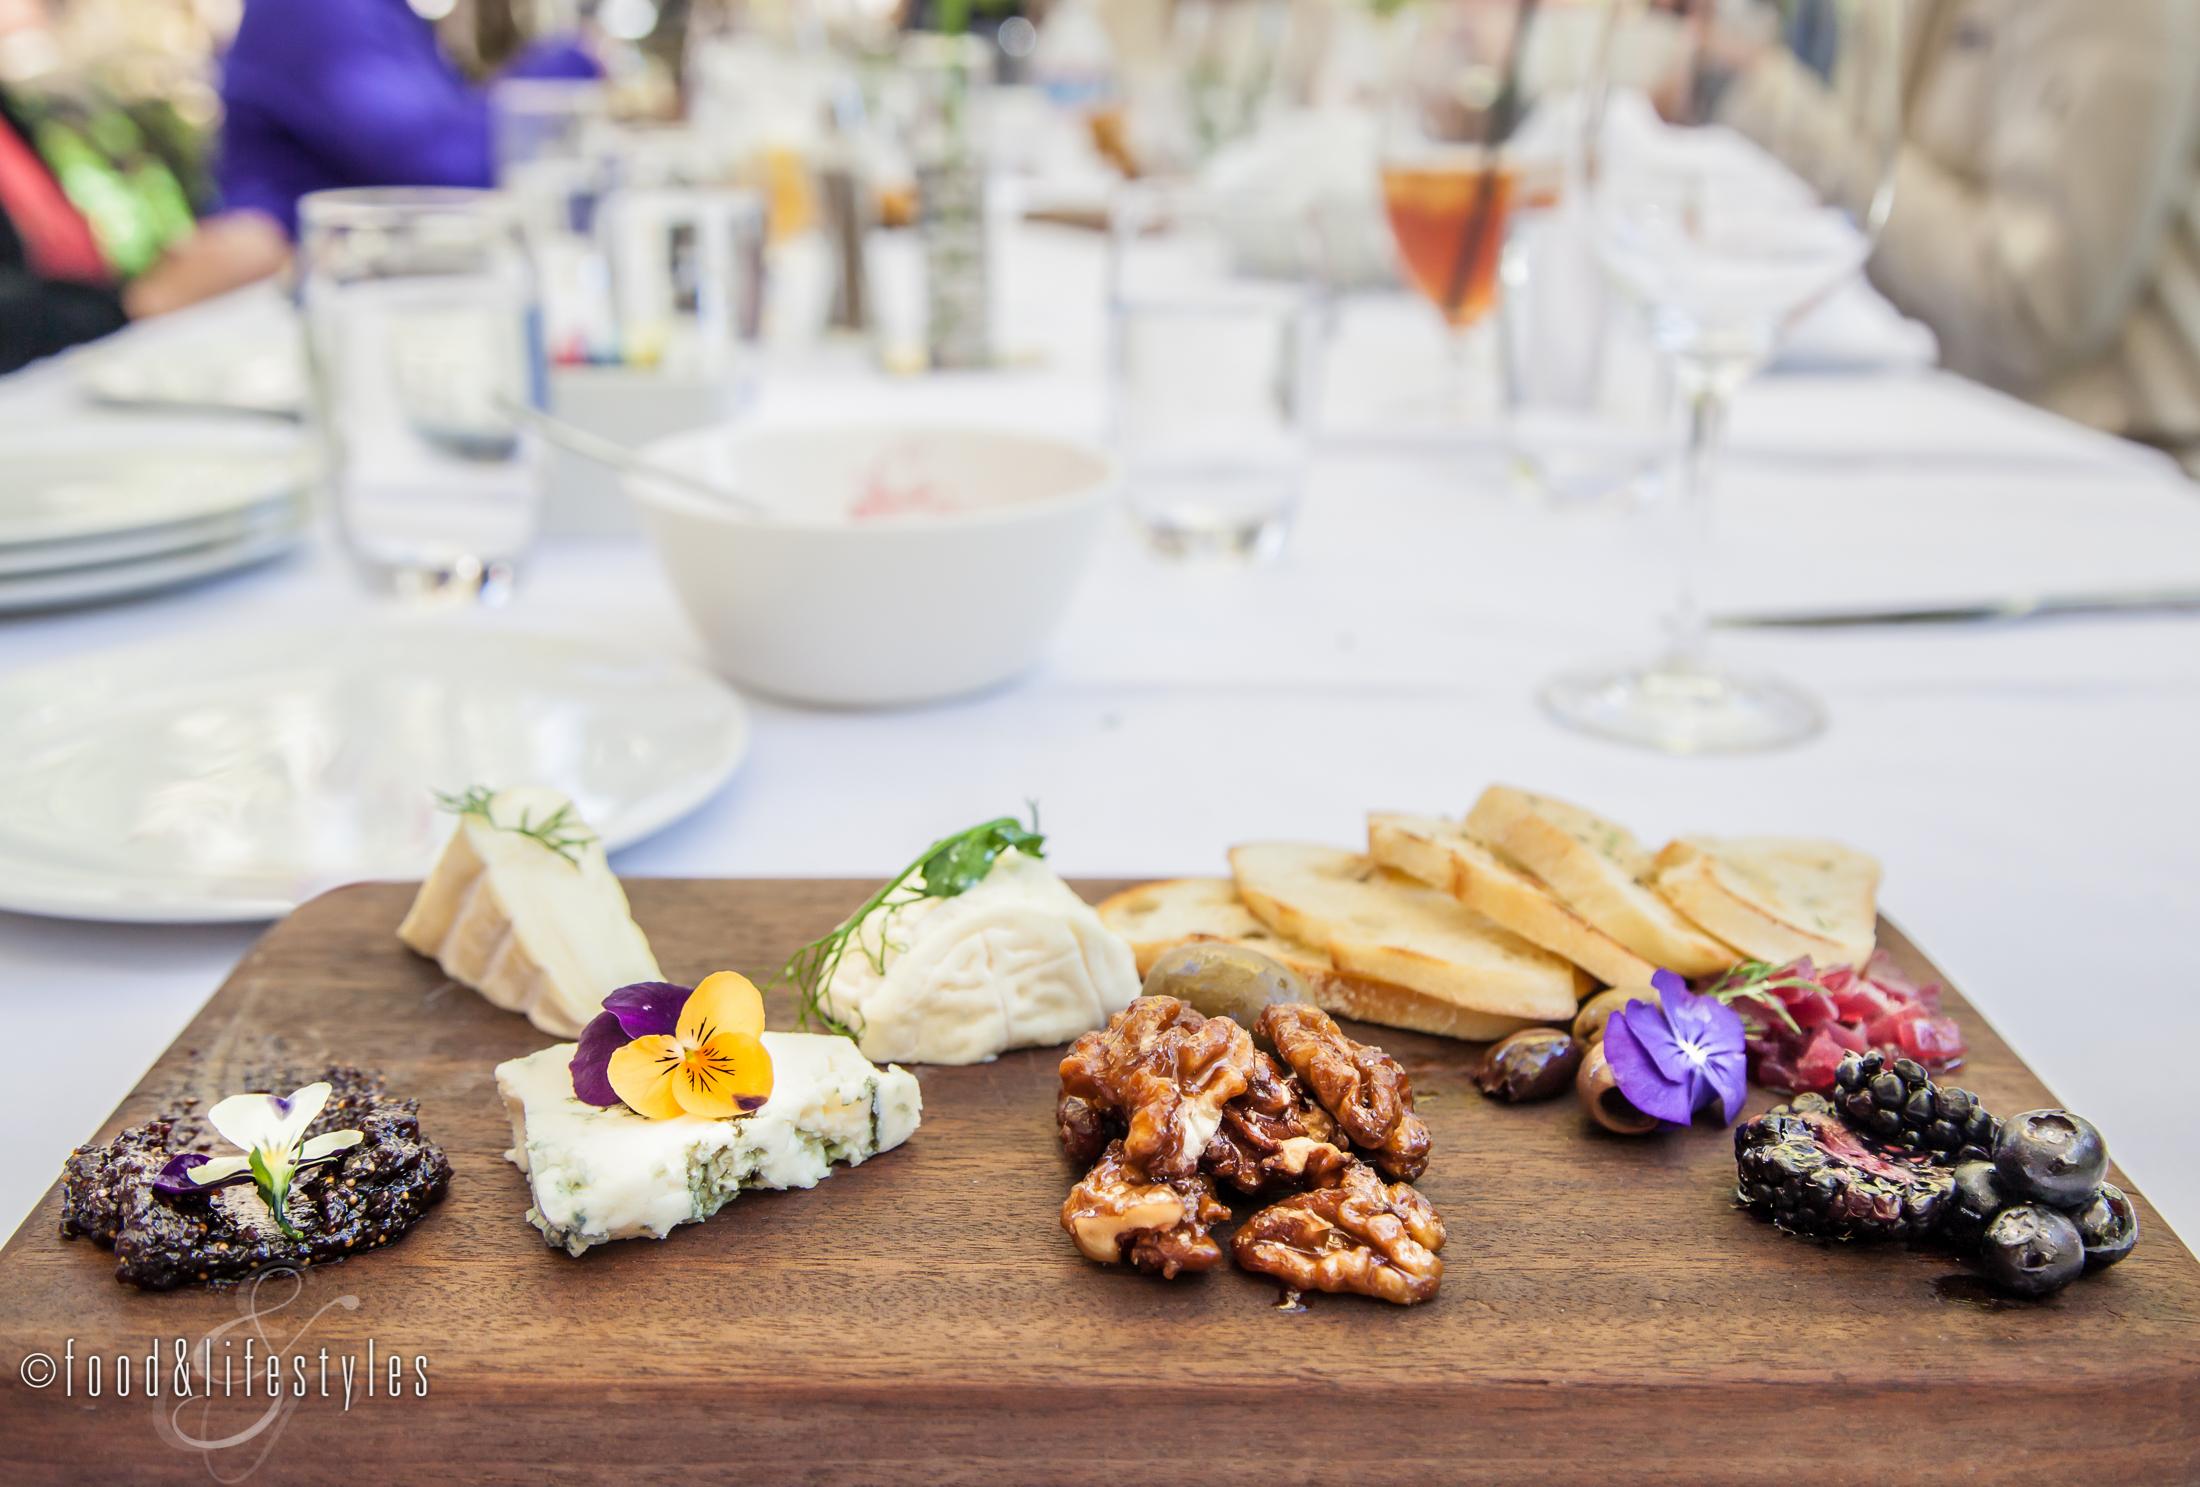 A wonderful cheese platter